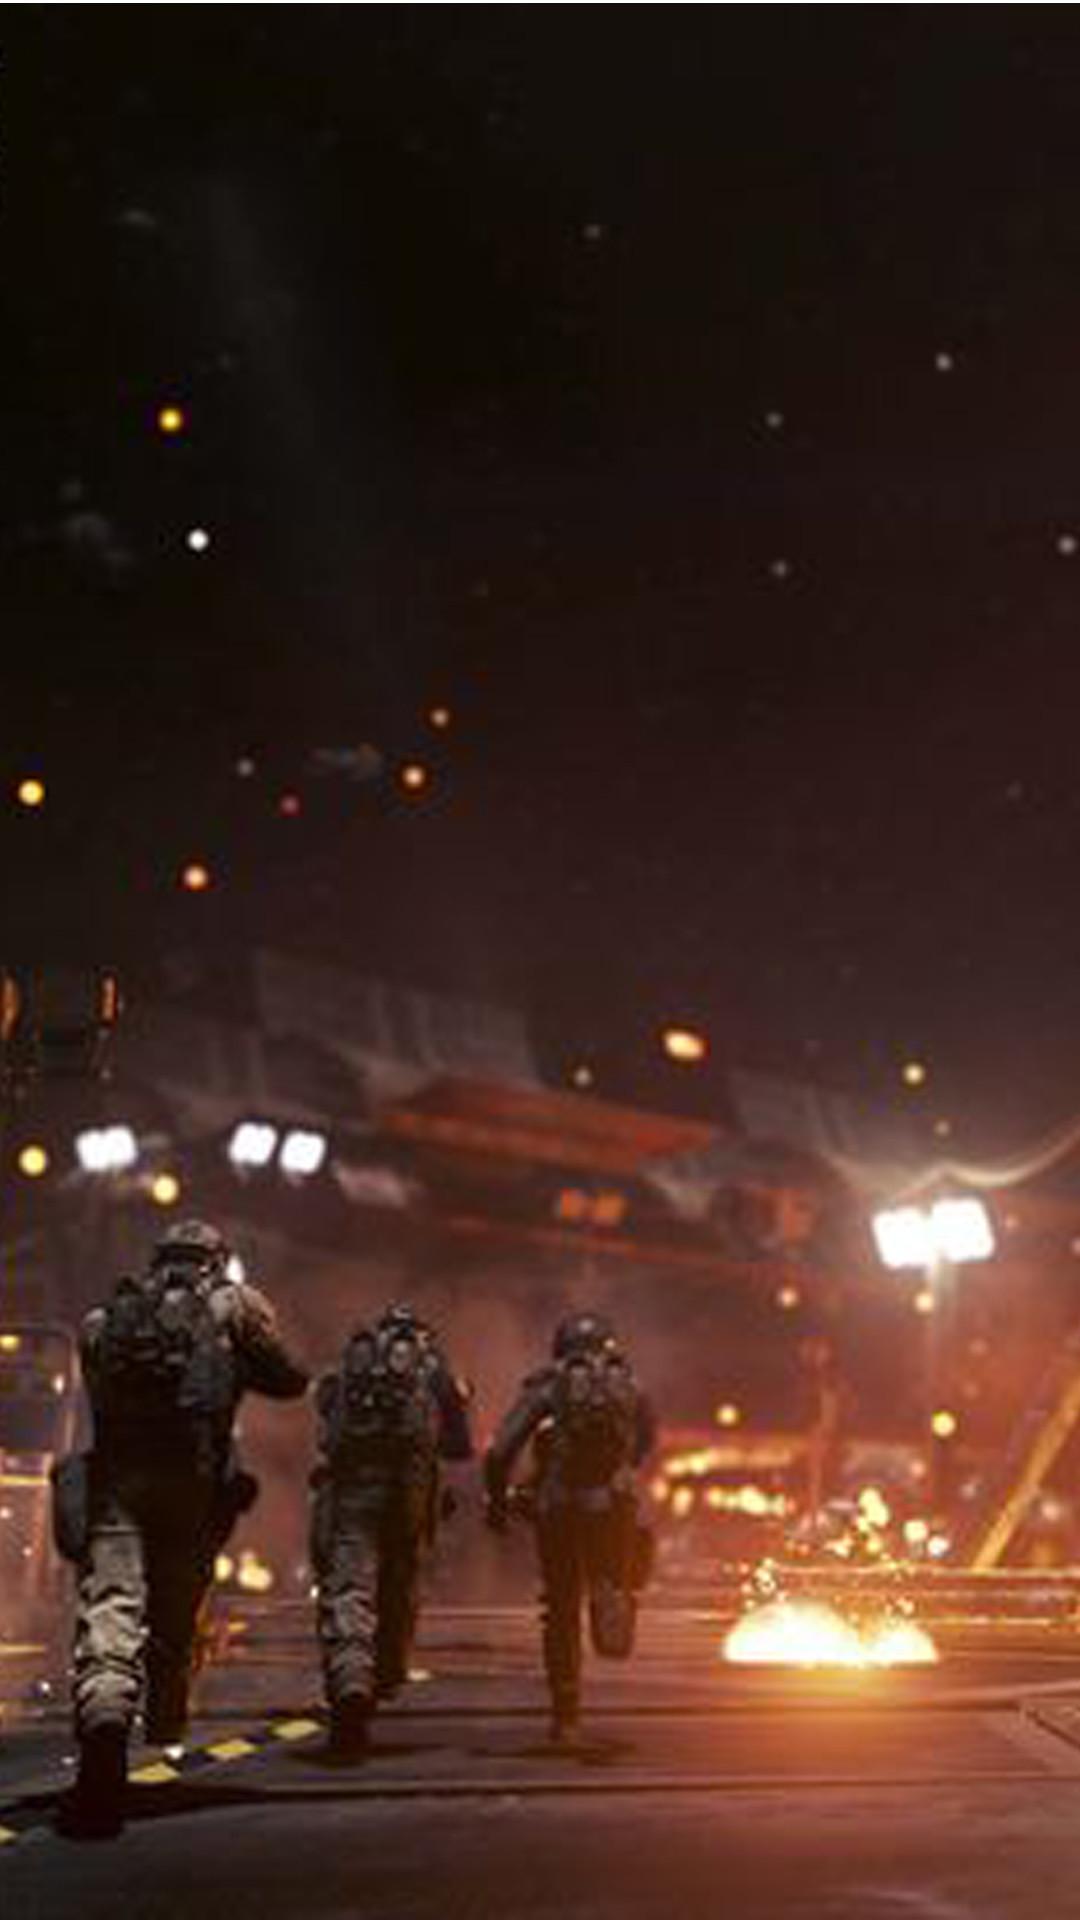 Call of Duty Infinite Warfare iphone wallpaper Pinterest